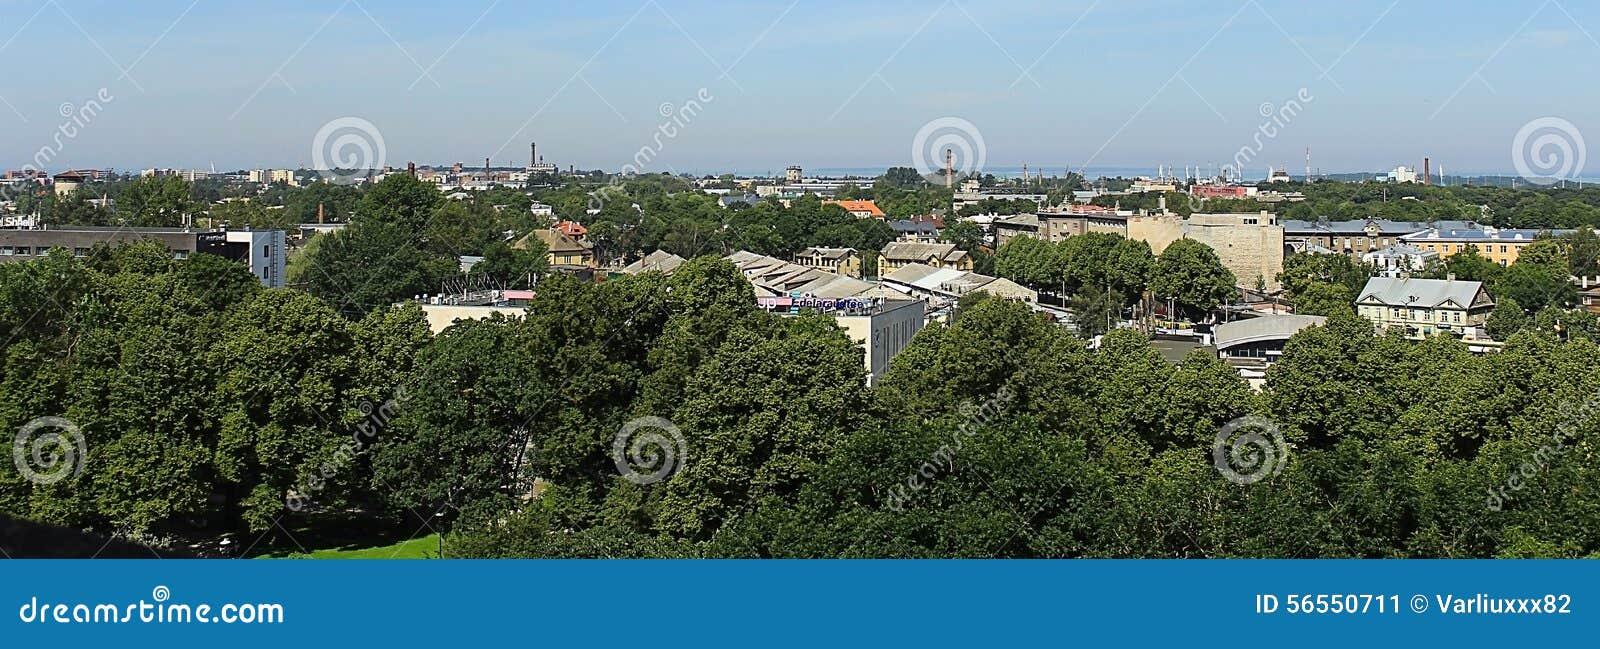 Download παλαιά πόλη του Ταλίν στοκ εικόνα. εικόνα από πέτρα, υψηλός - 56550711